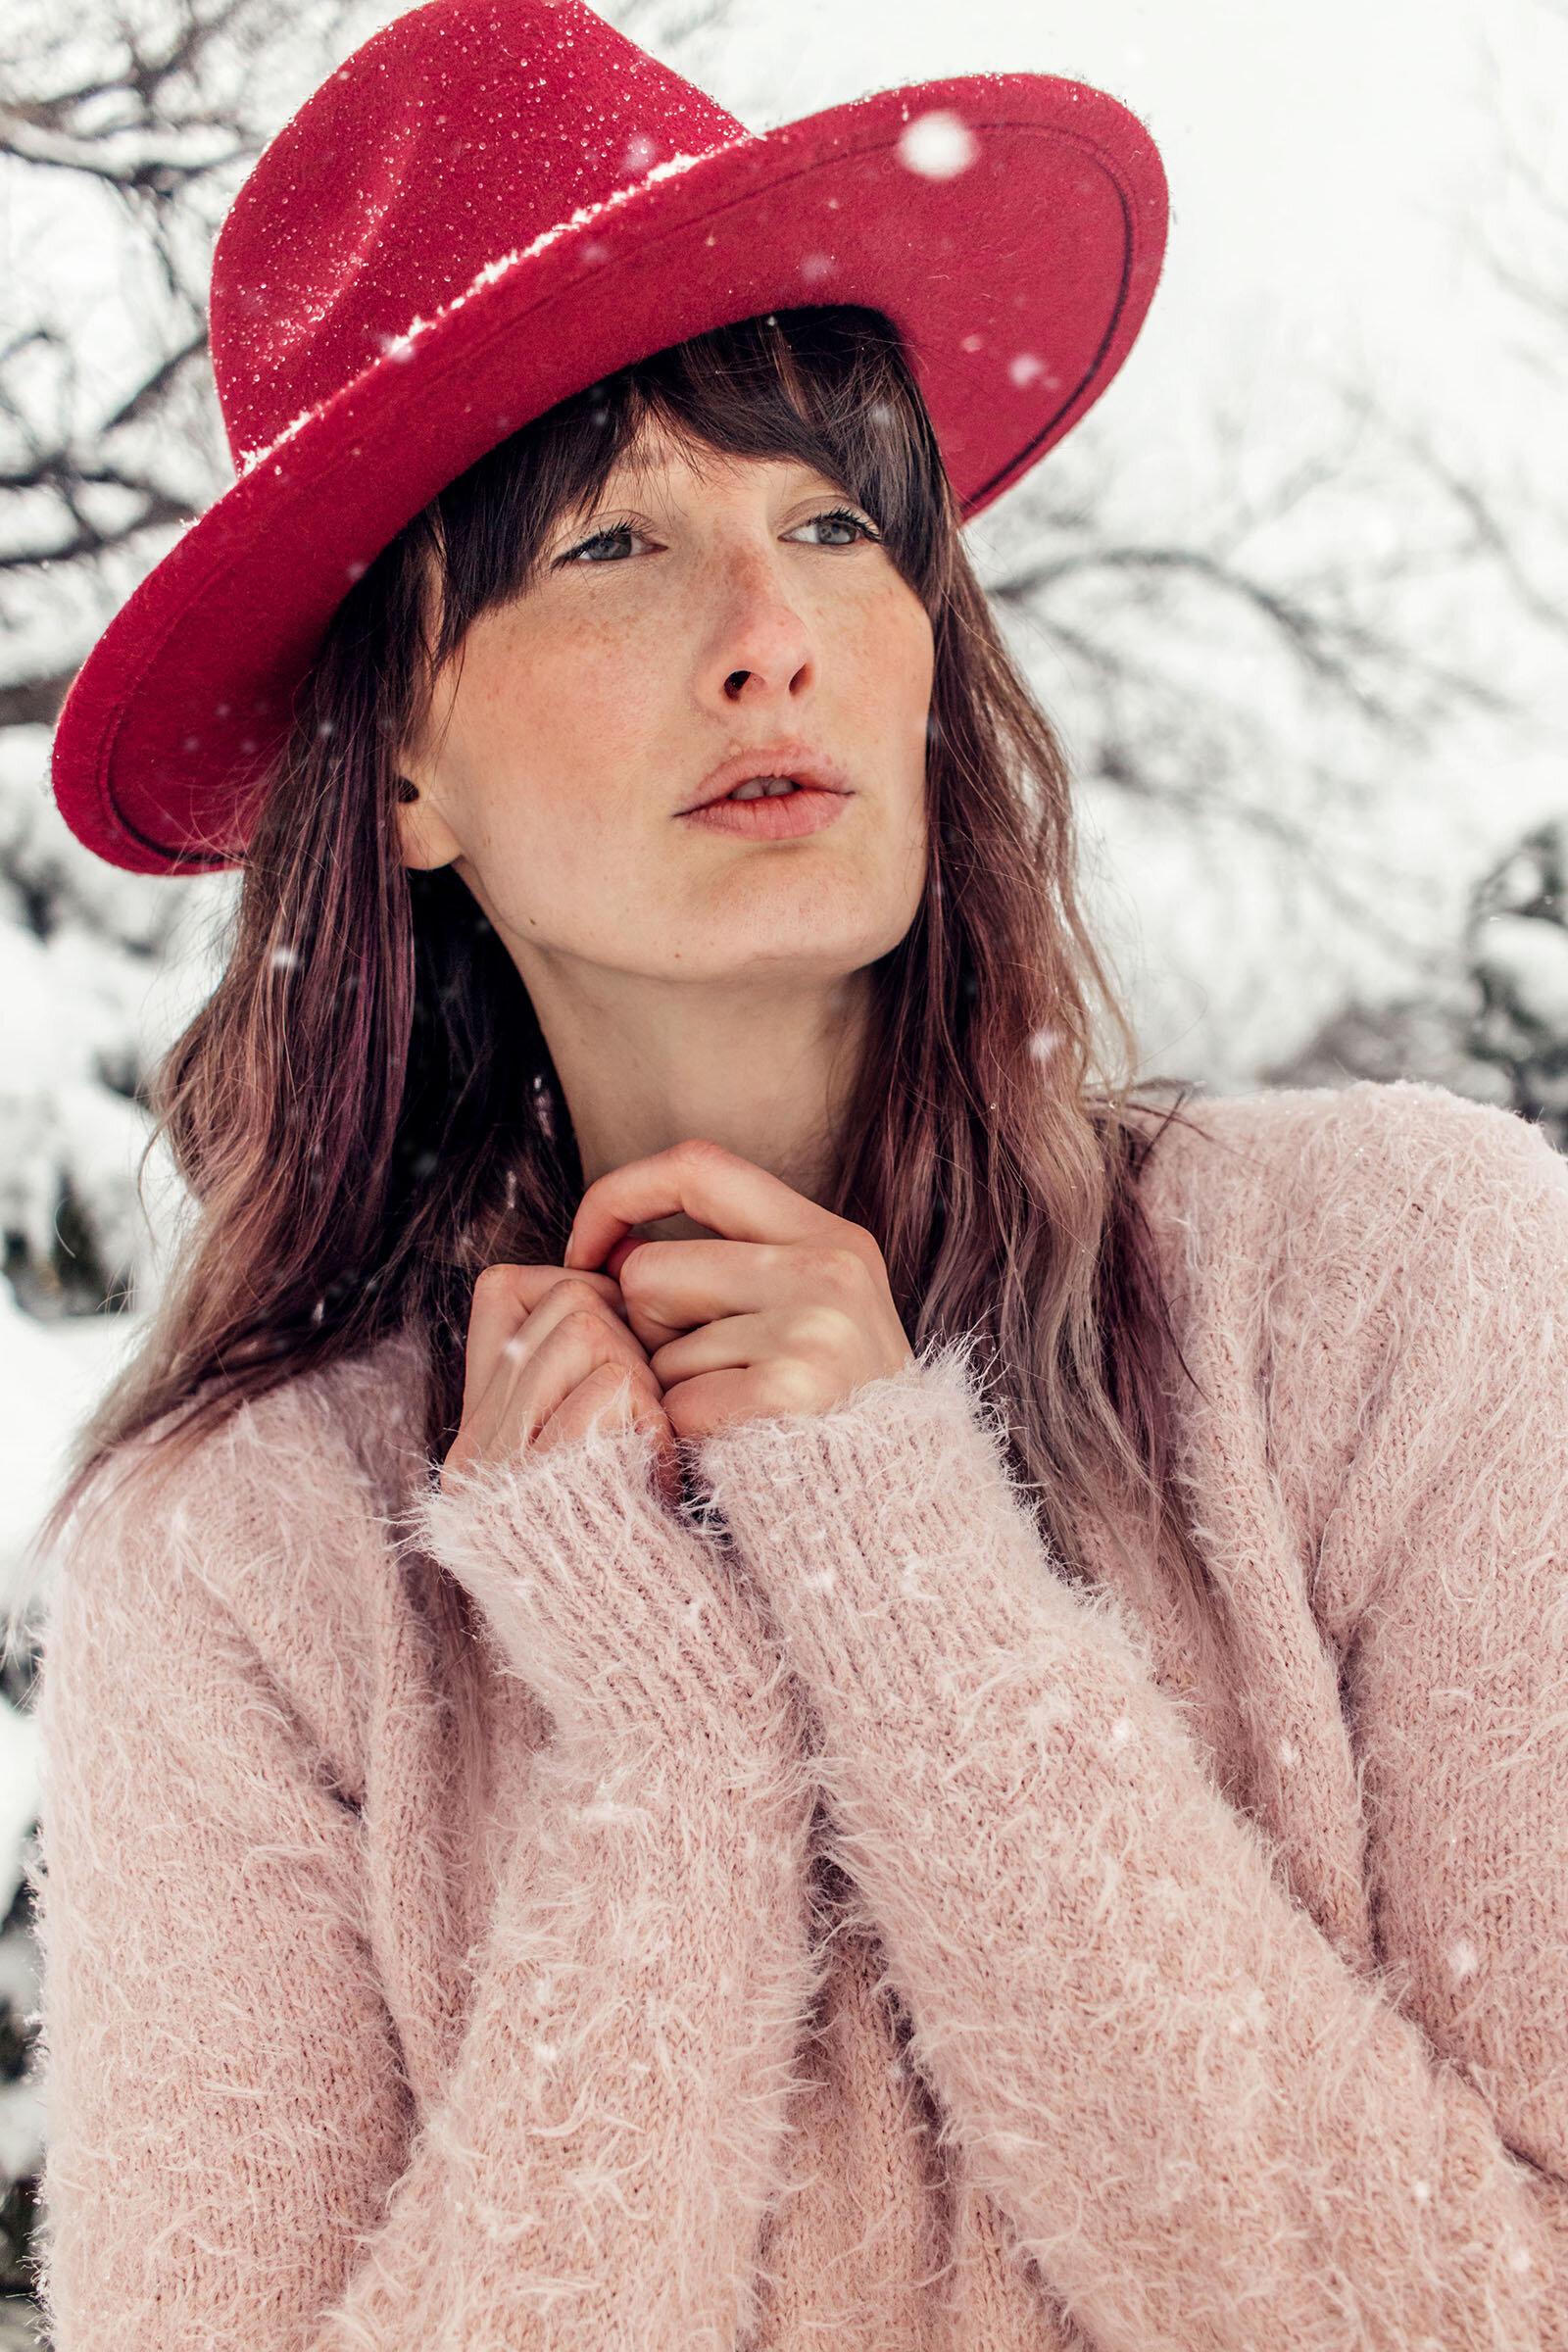 GG_winter_portrait.jpg